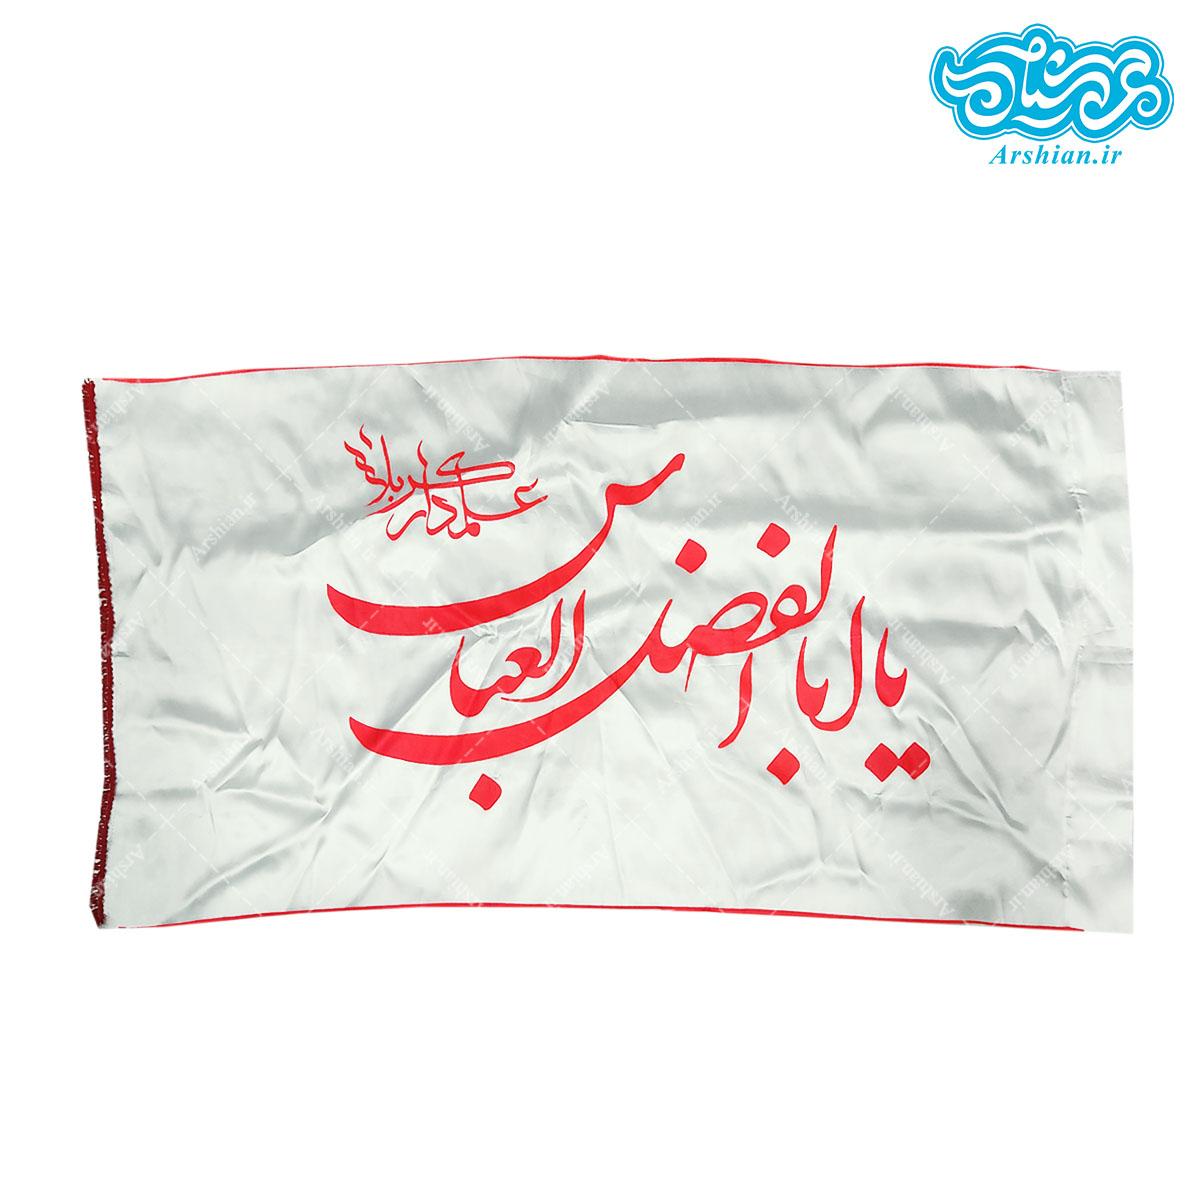 پرچم ساتن یاابالفضل العباس کد018